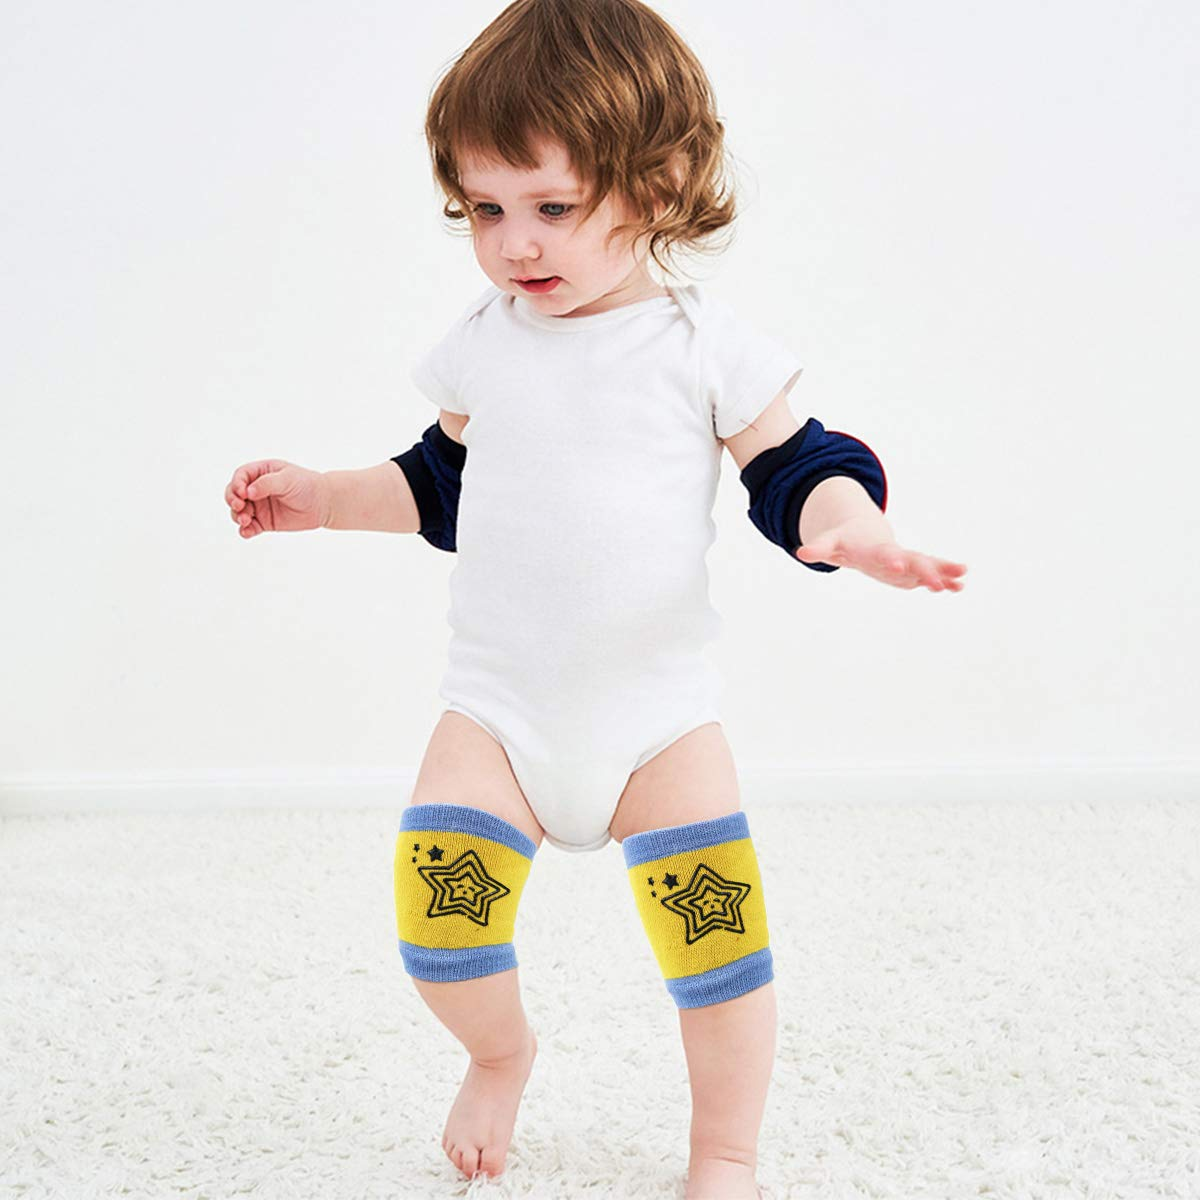 5 Pares Rodilleras Bebe Gateo El/ásticas Baby Leg Warmer para 0 a 36 meses Ni/ños Ni/ñas Algod/ón Rodilleras Beb/é para Gatear Antideslizantes Gateo Protectores de Rodillas